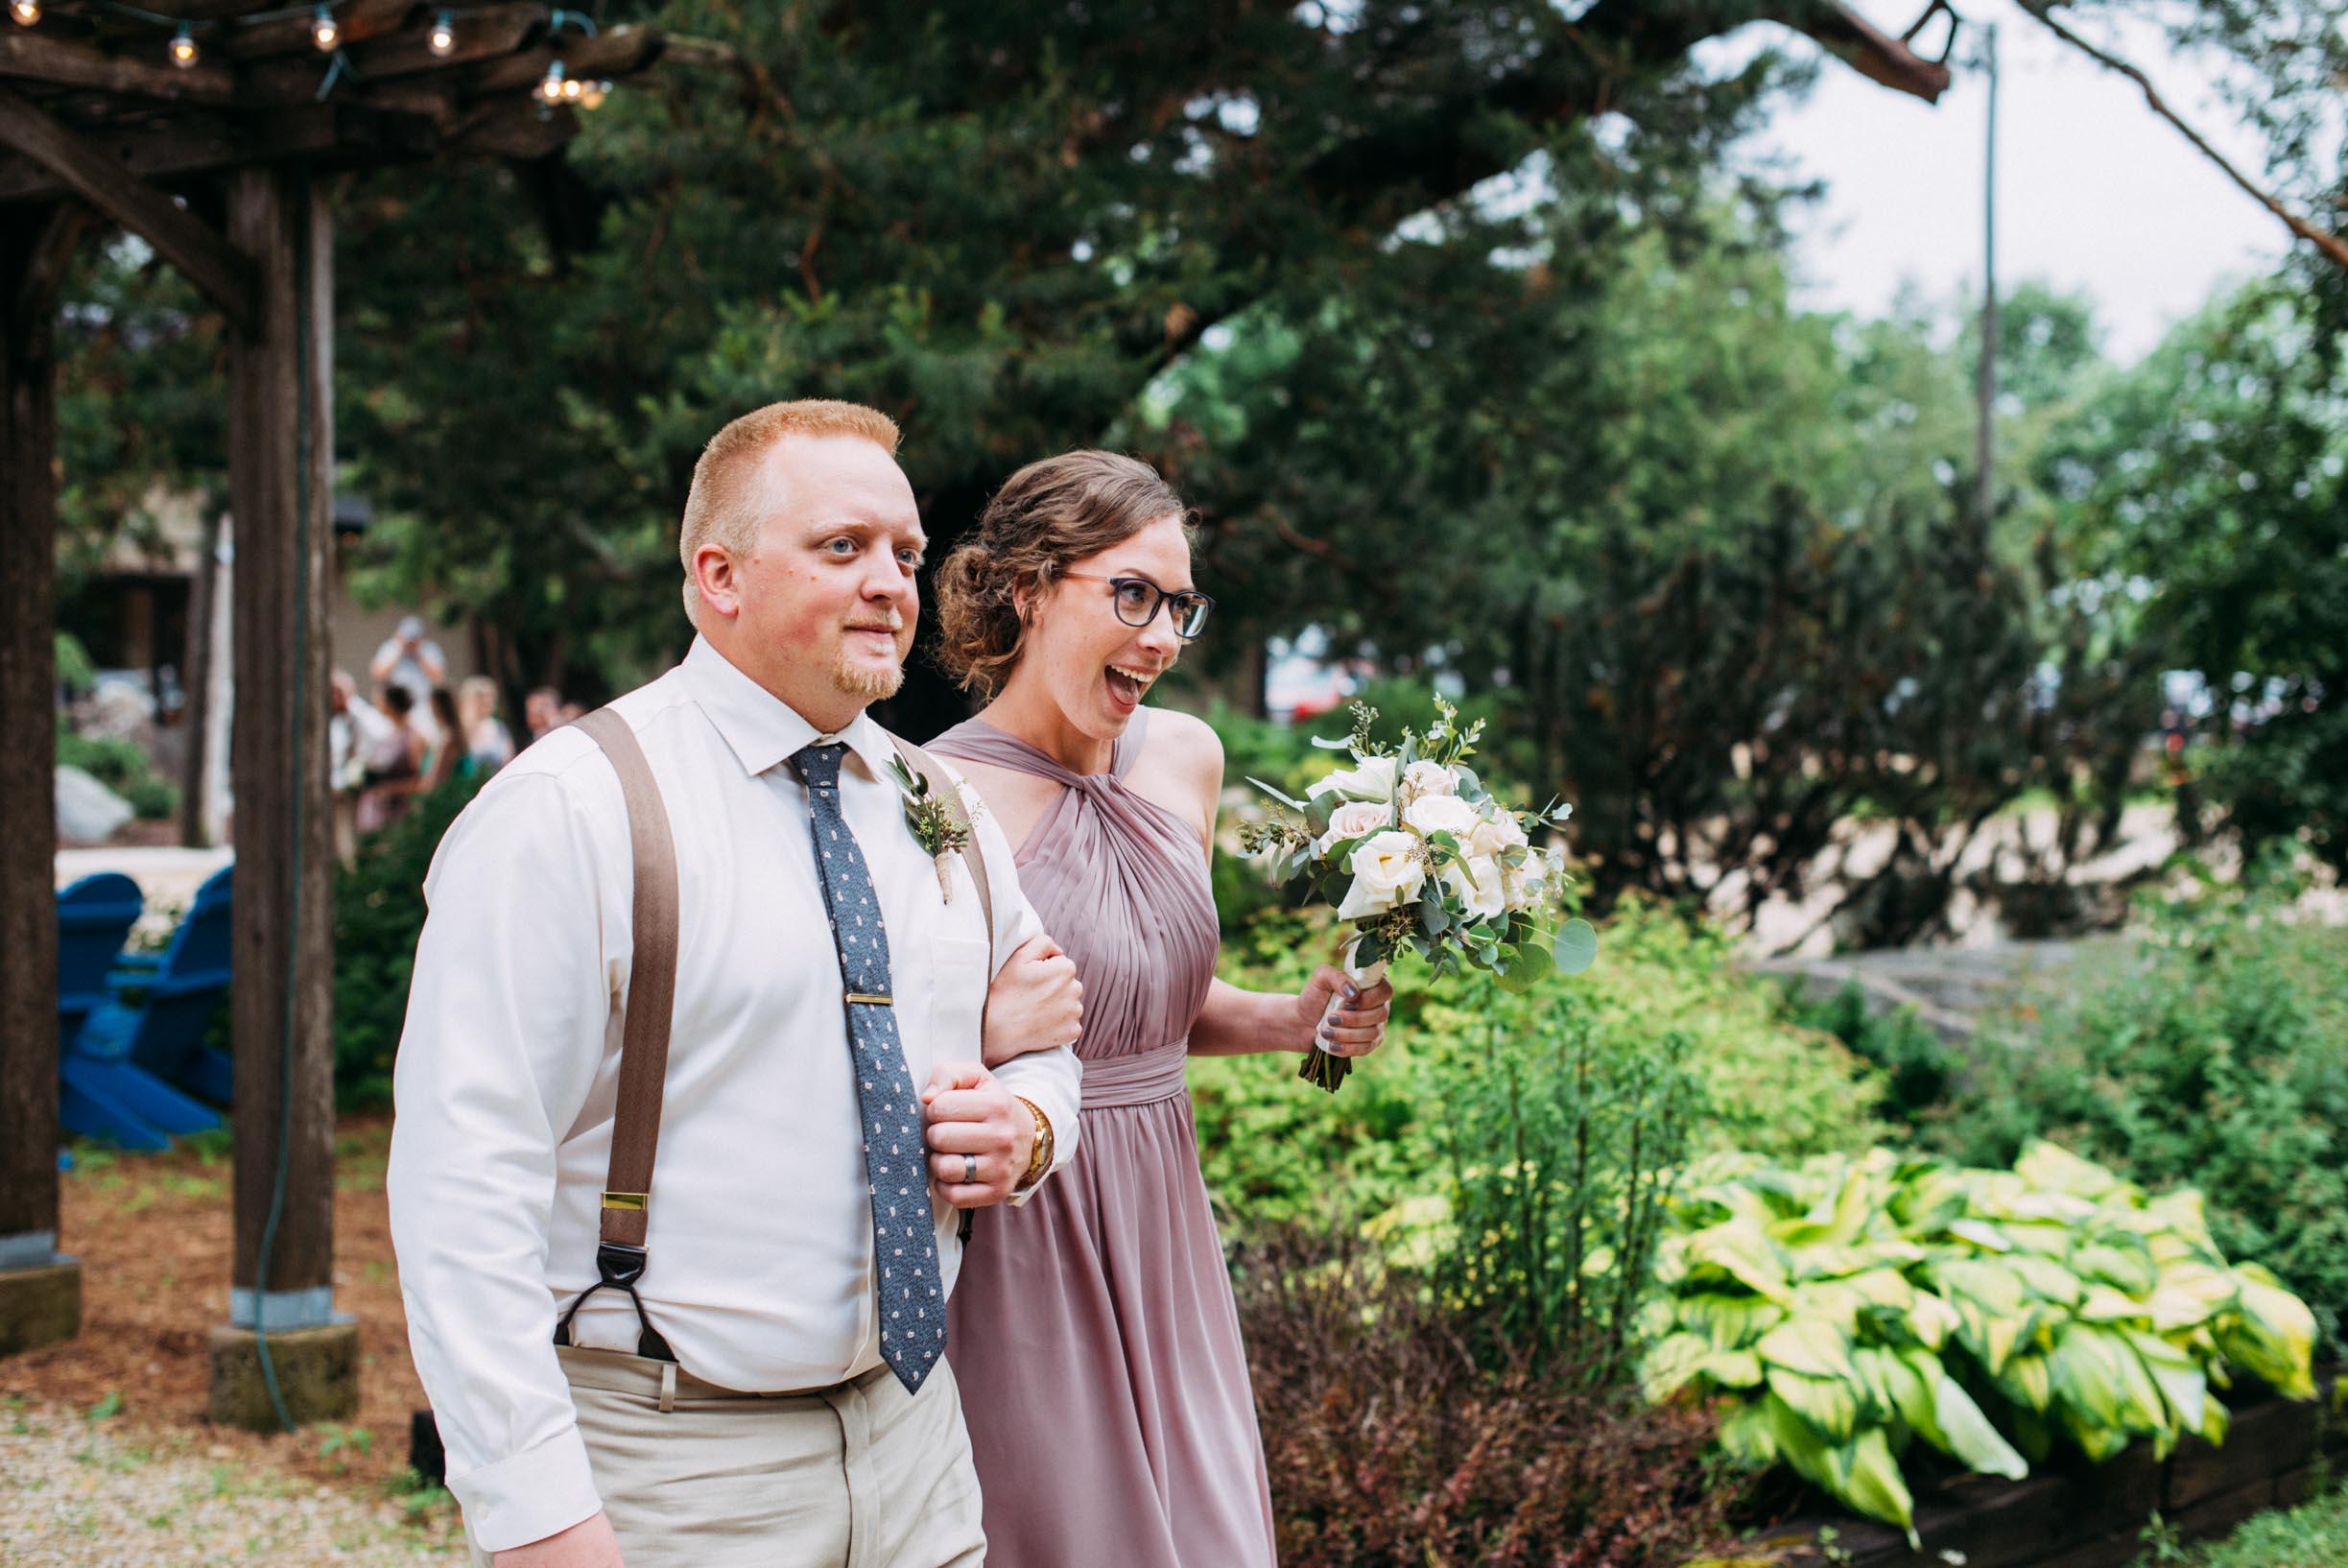 39-Jess_Jeremy_Minnesota_Wedding_Ceremony.jpg